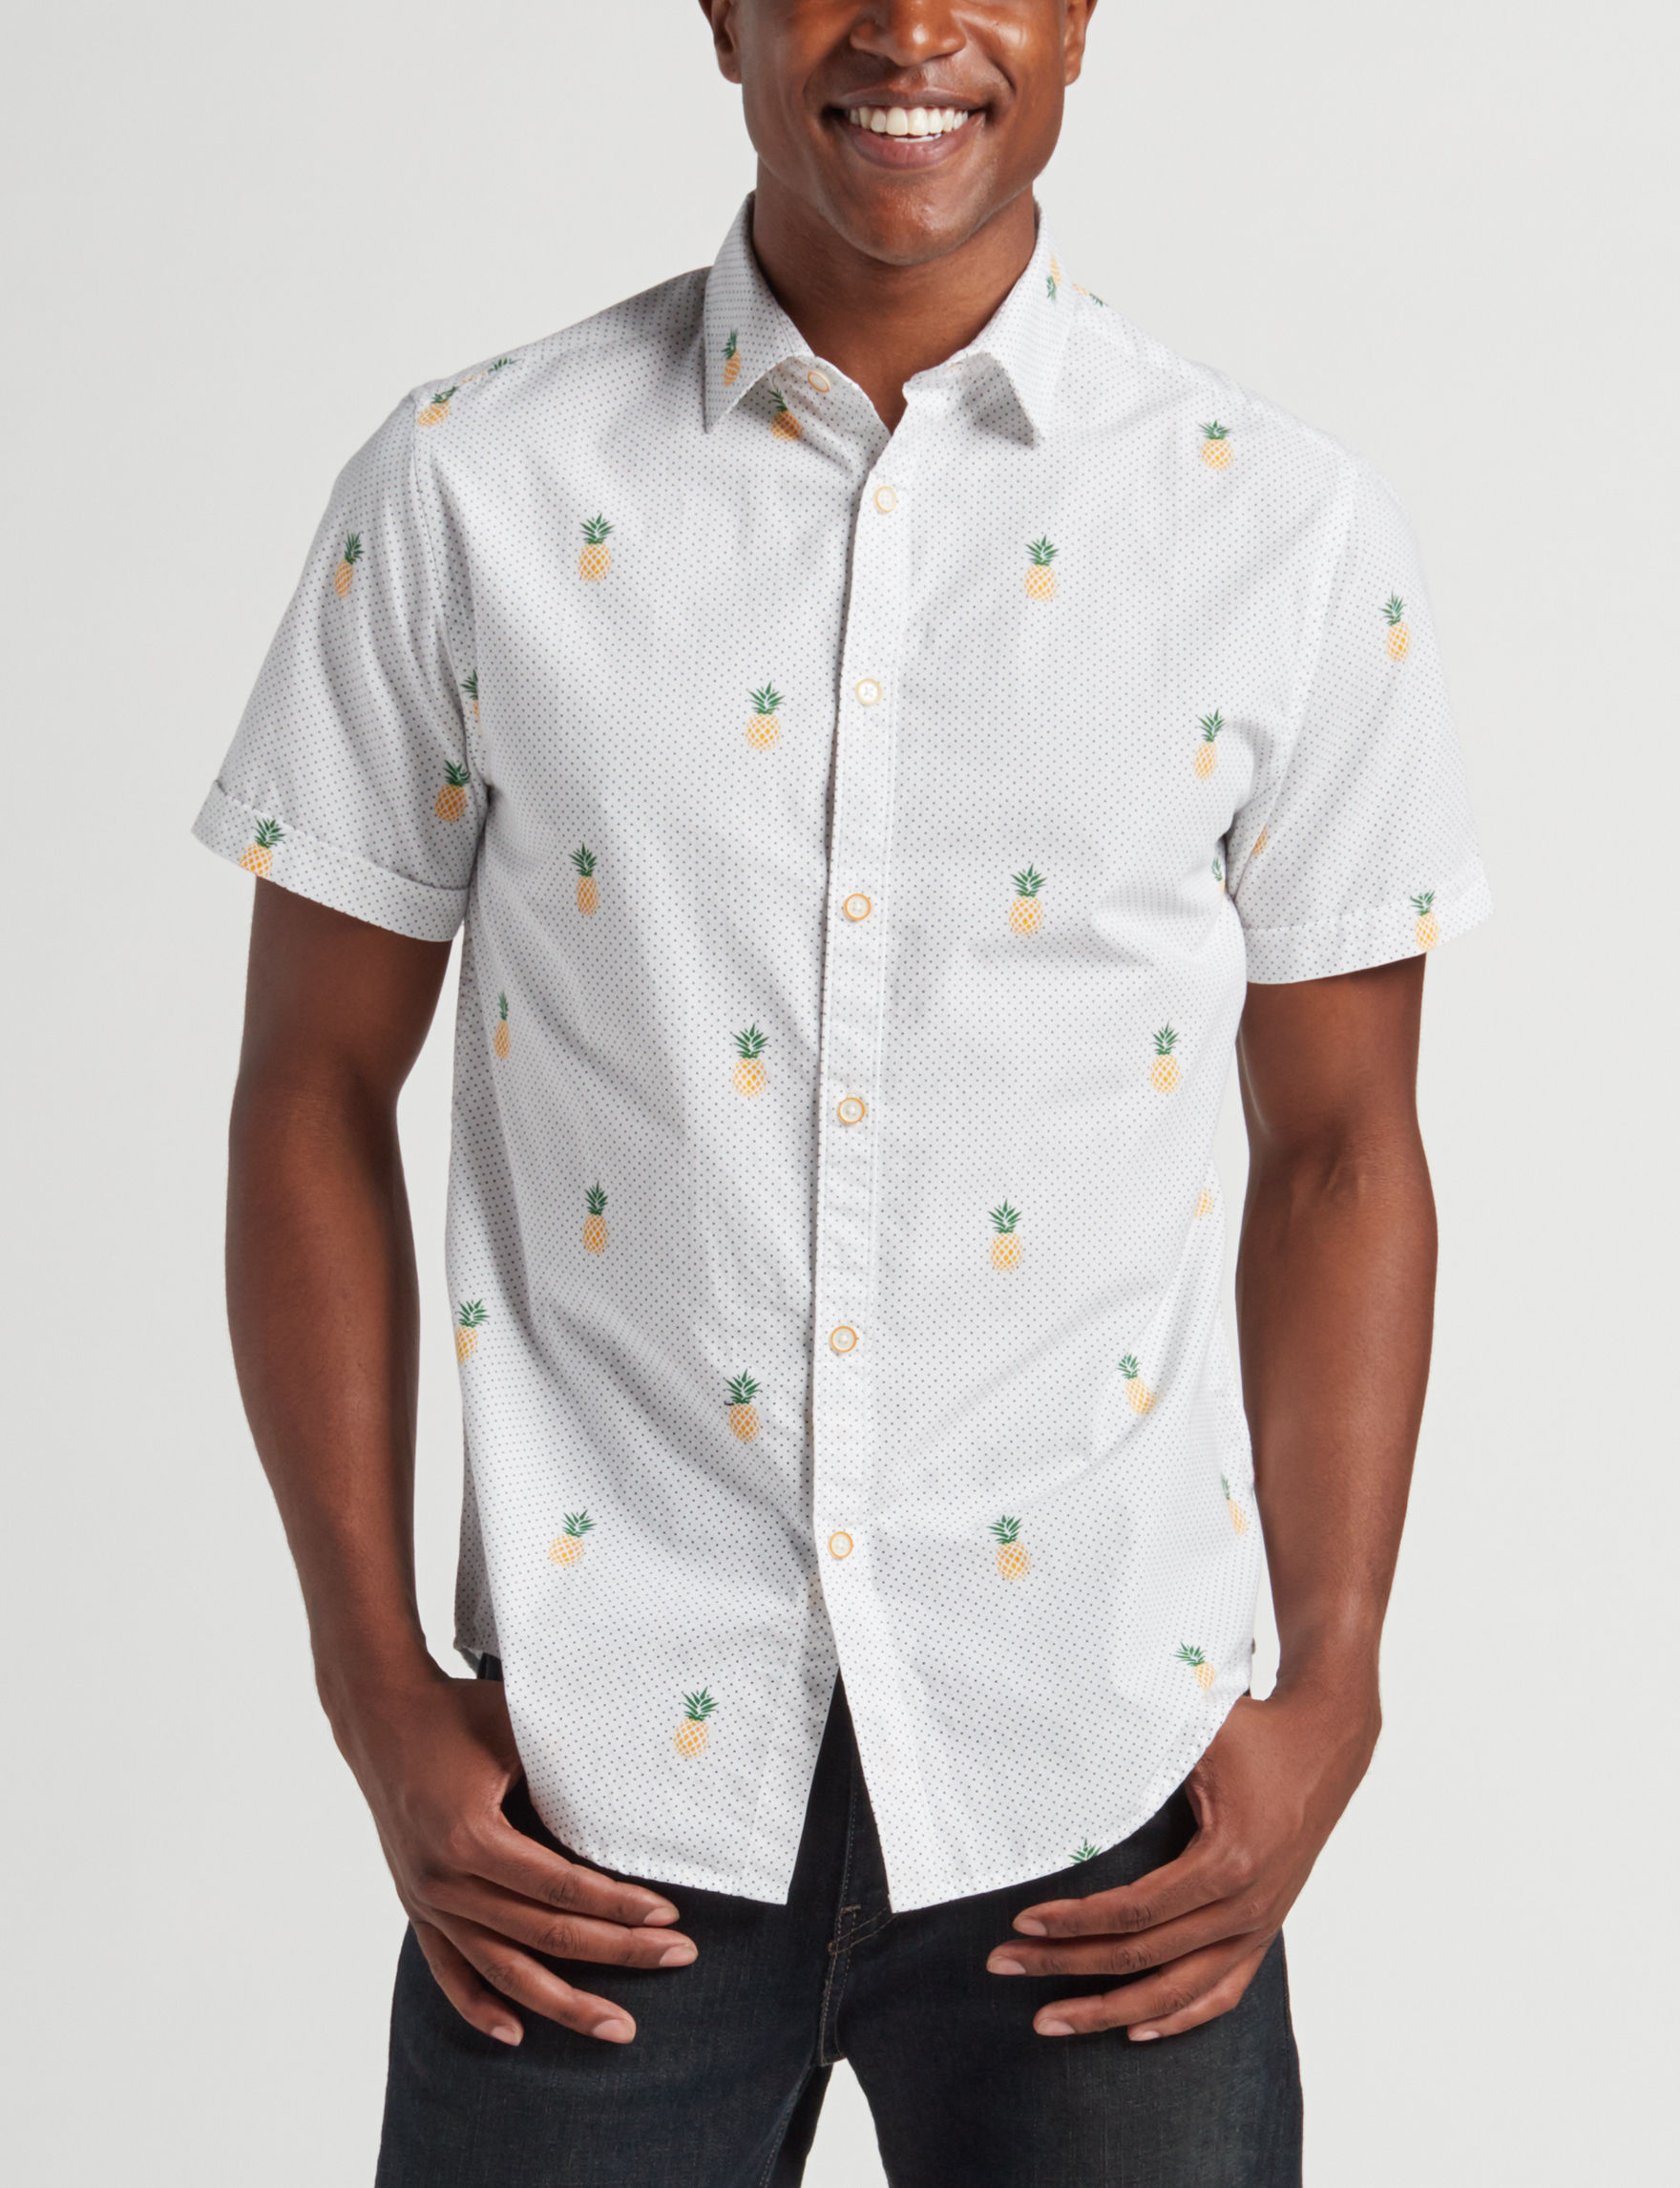 Cactus Man White Casual Button Down Shirts